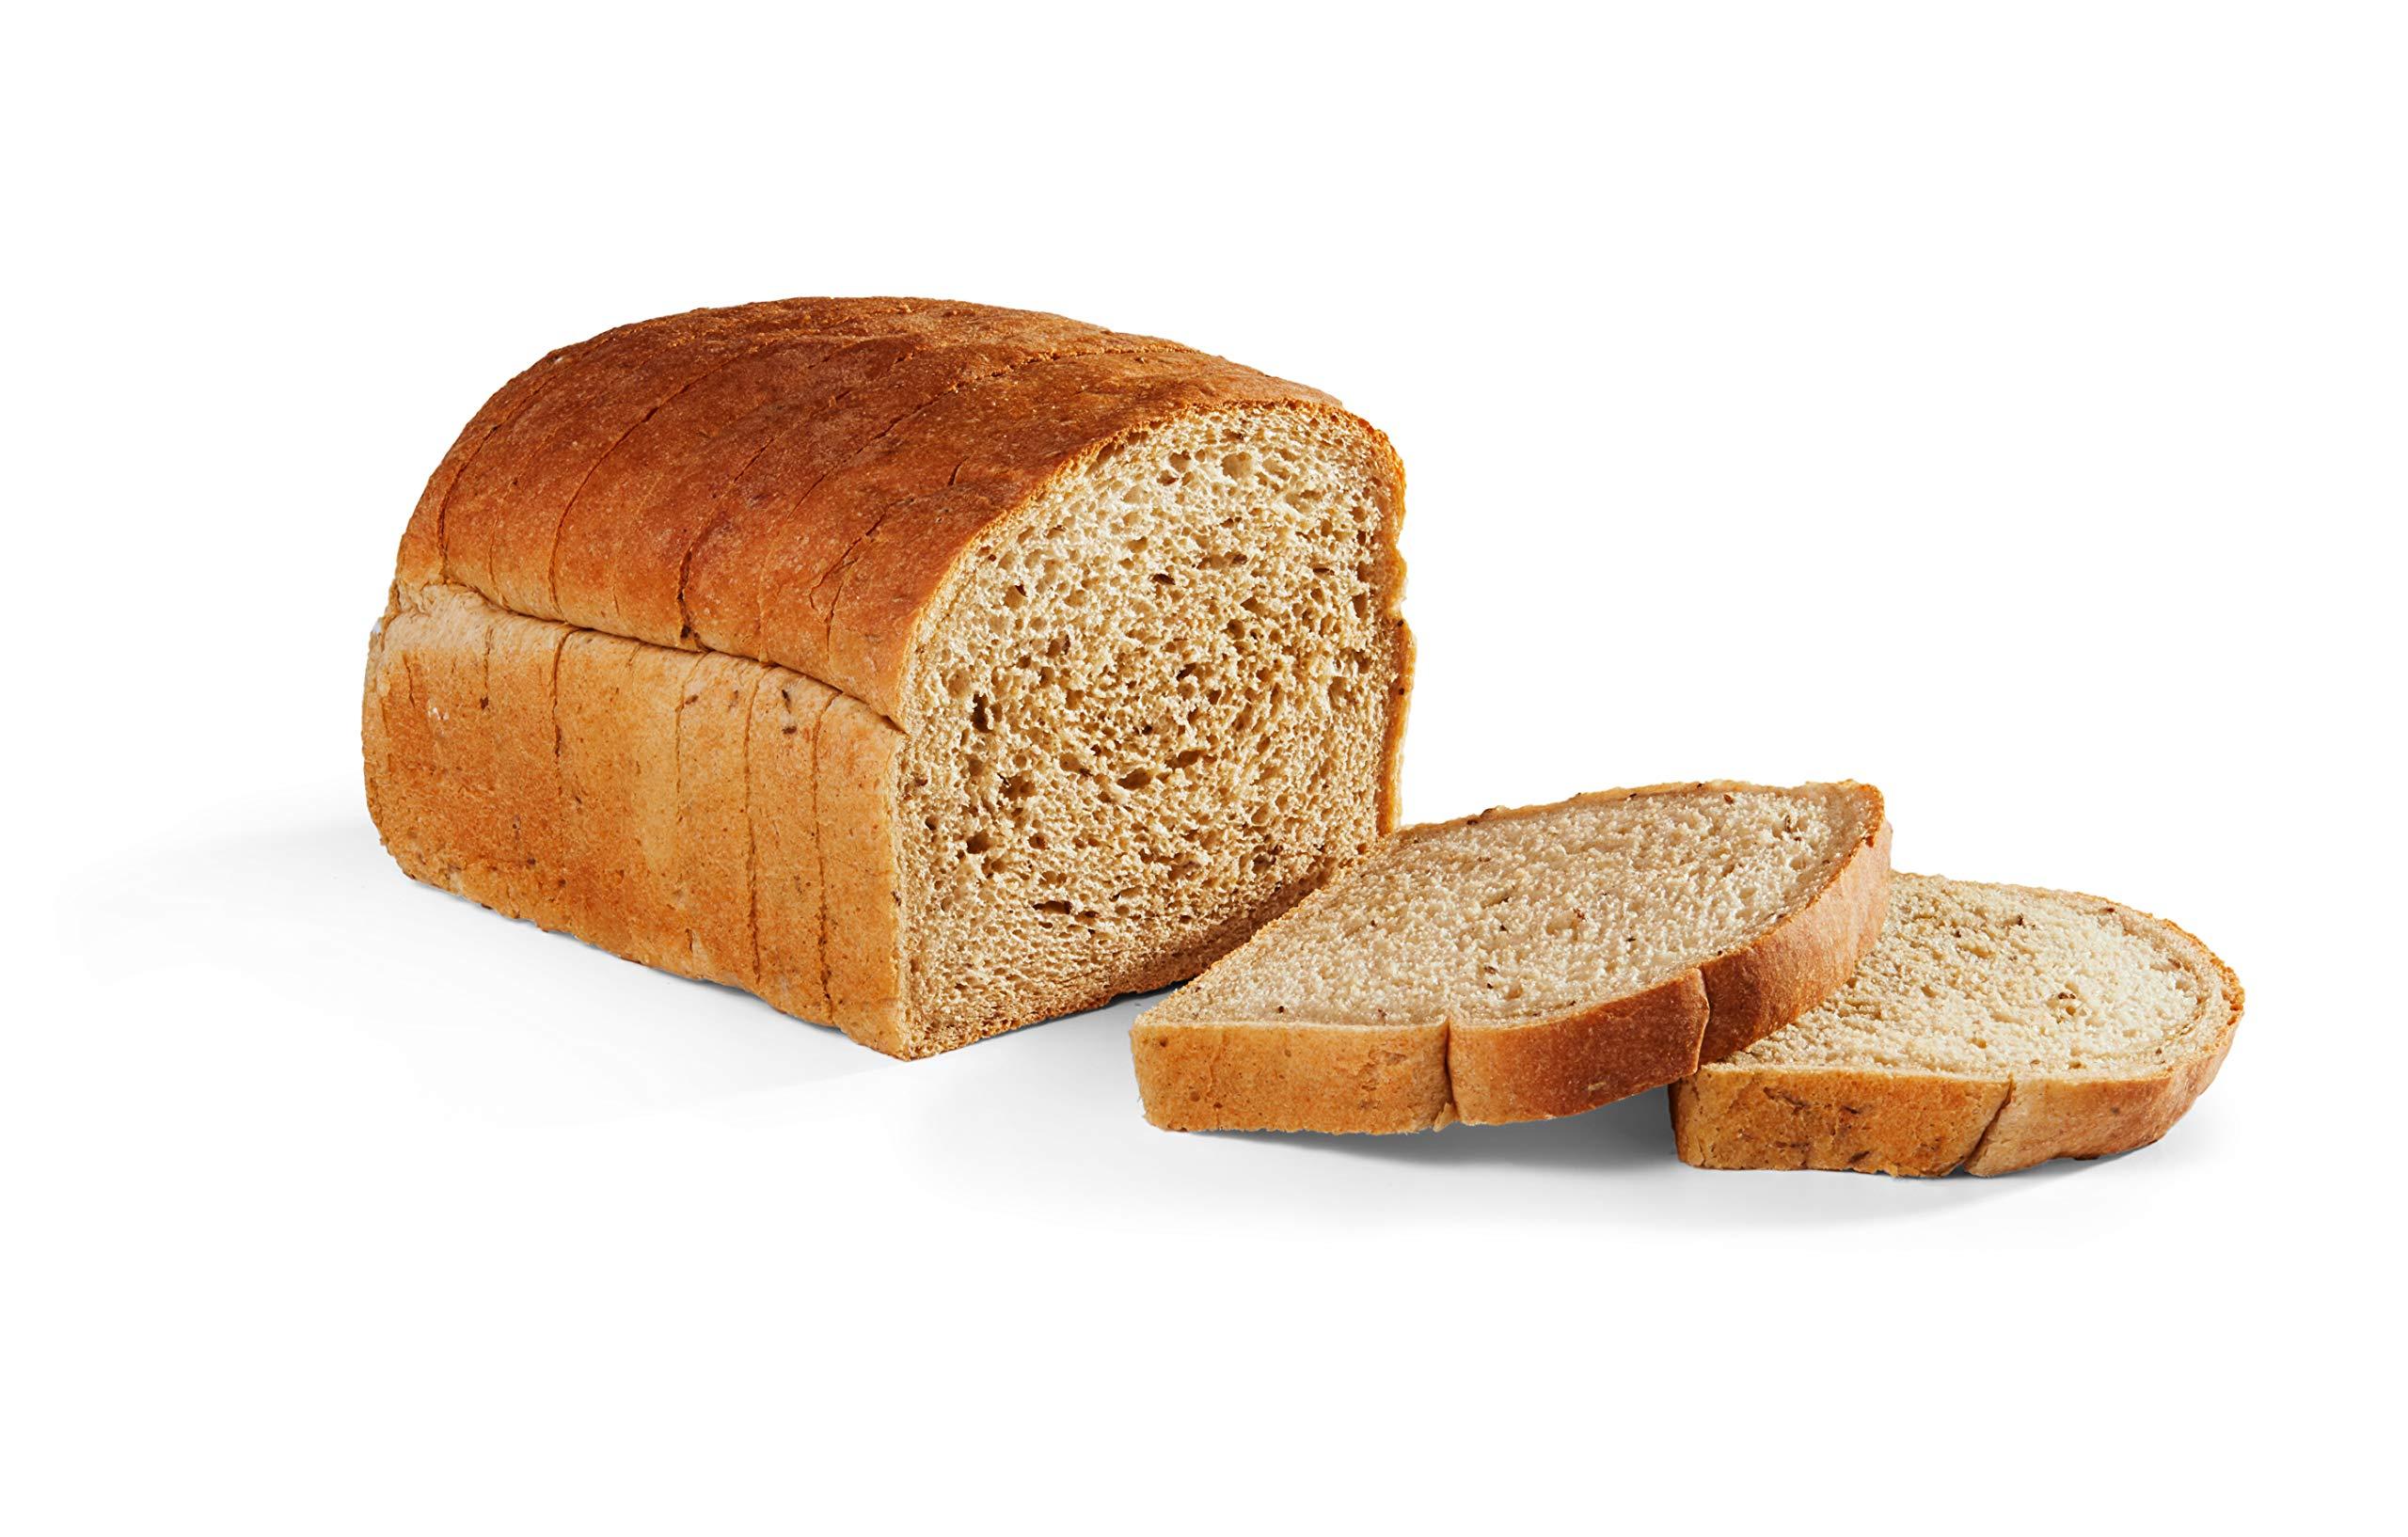 Klosterman Premium Rye Bread 24 oz Pack of 8